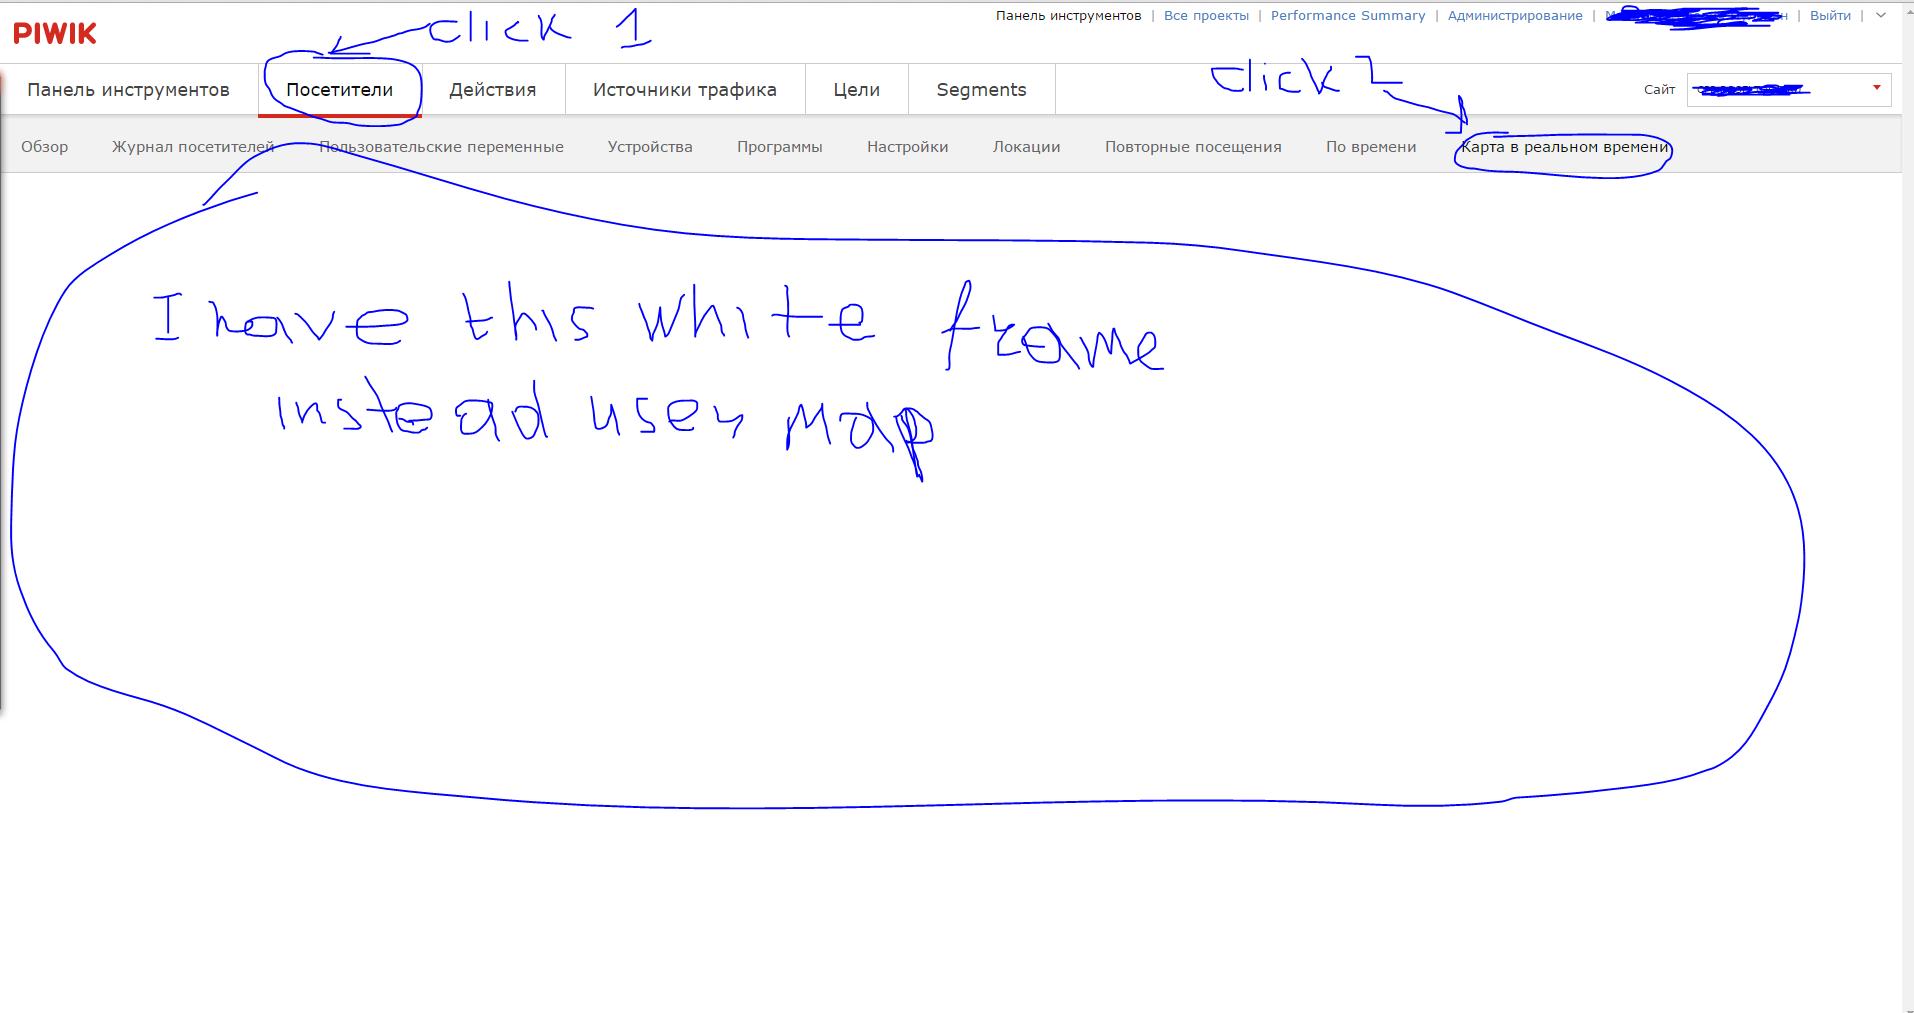 piwik_explain